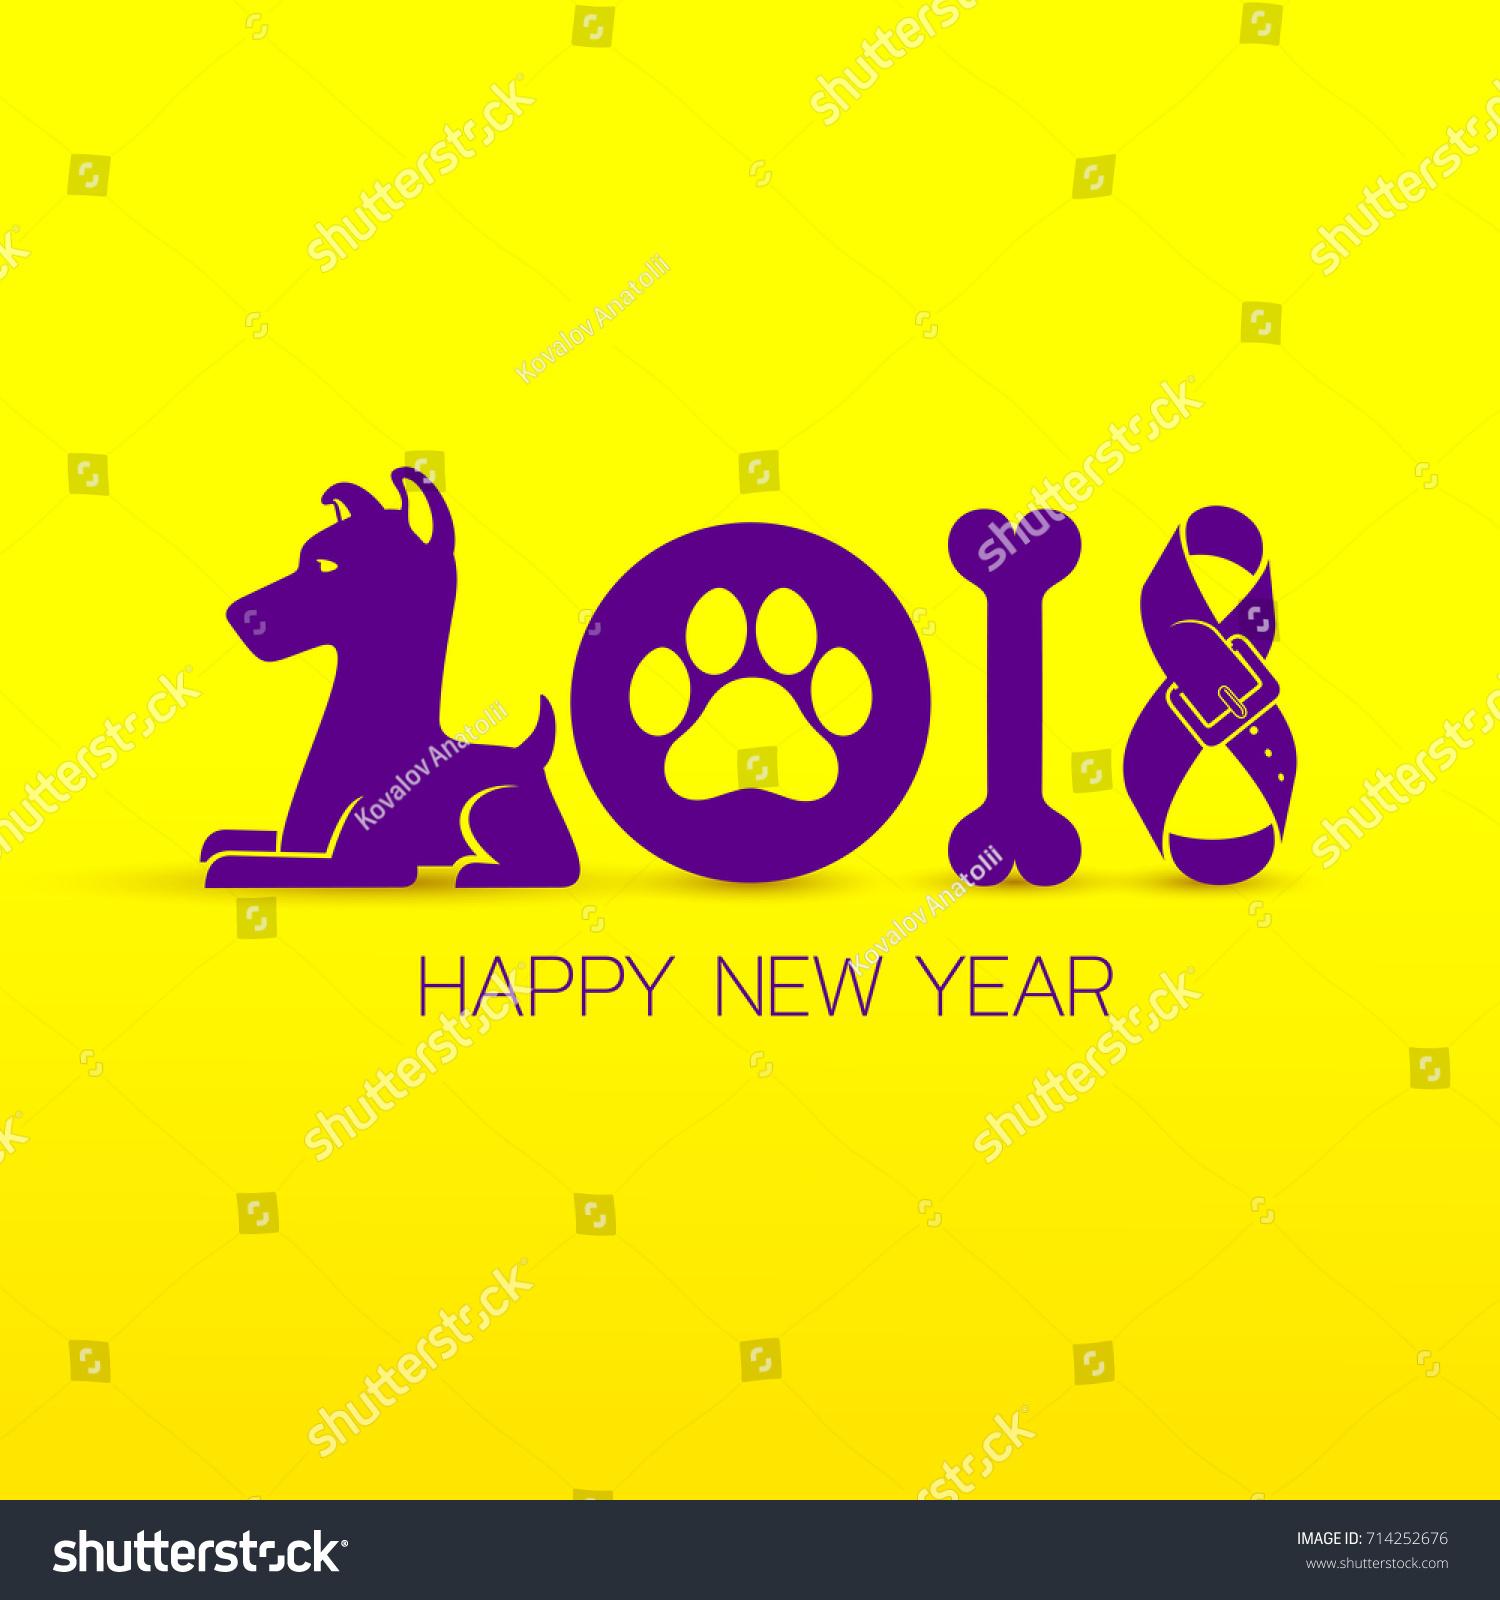 happy new year 2018 text design calendar dog symbols vector illustration isolated